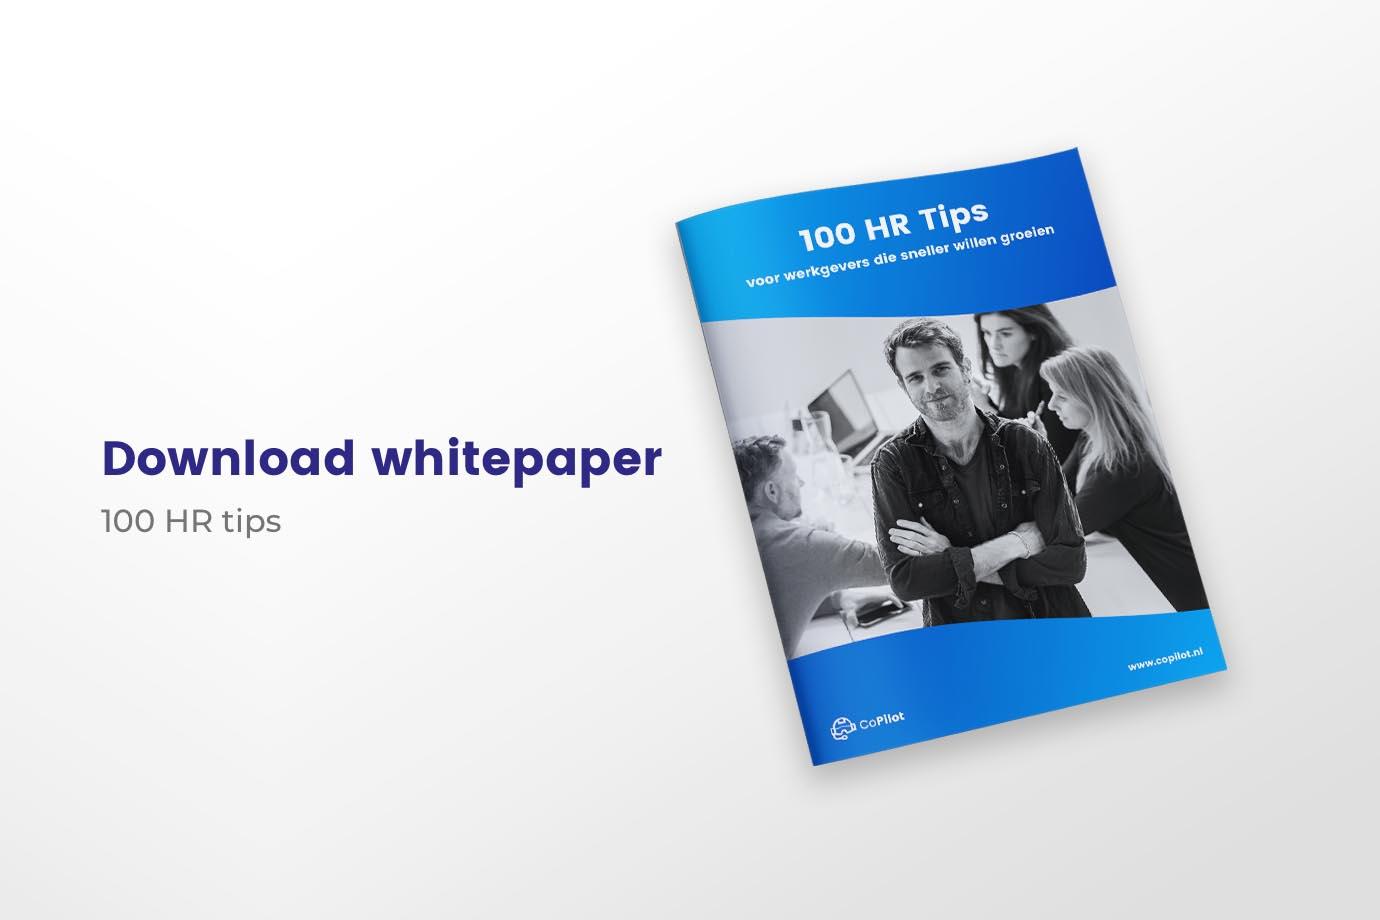 Whitepaper mockup CoPilot